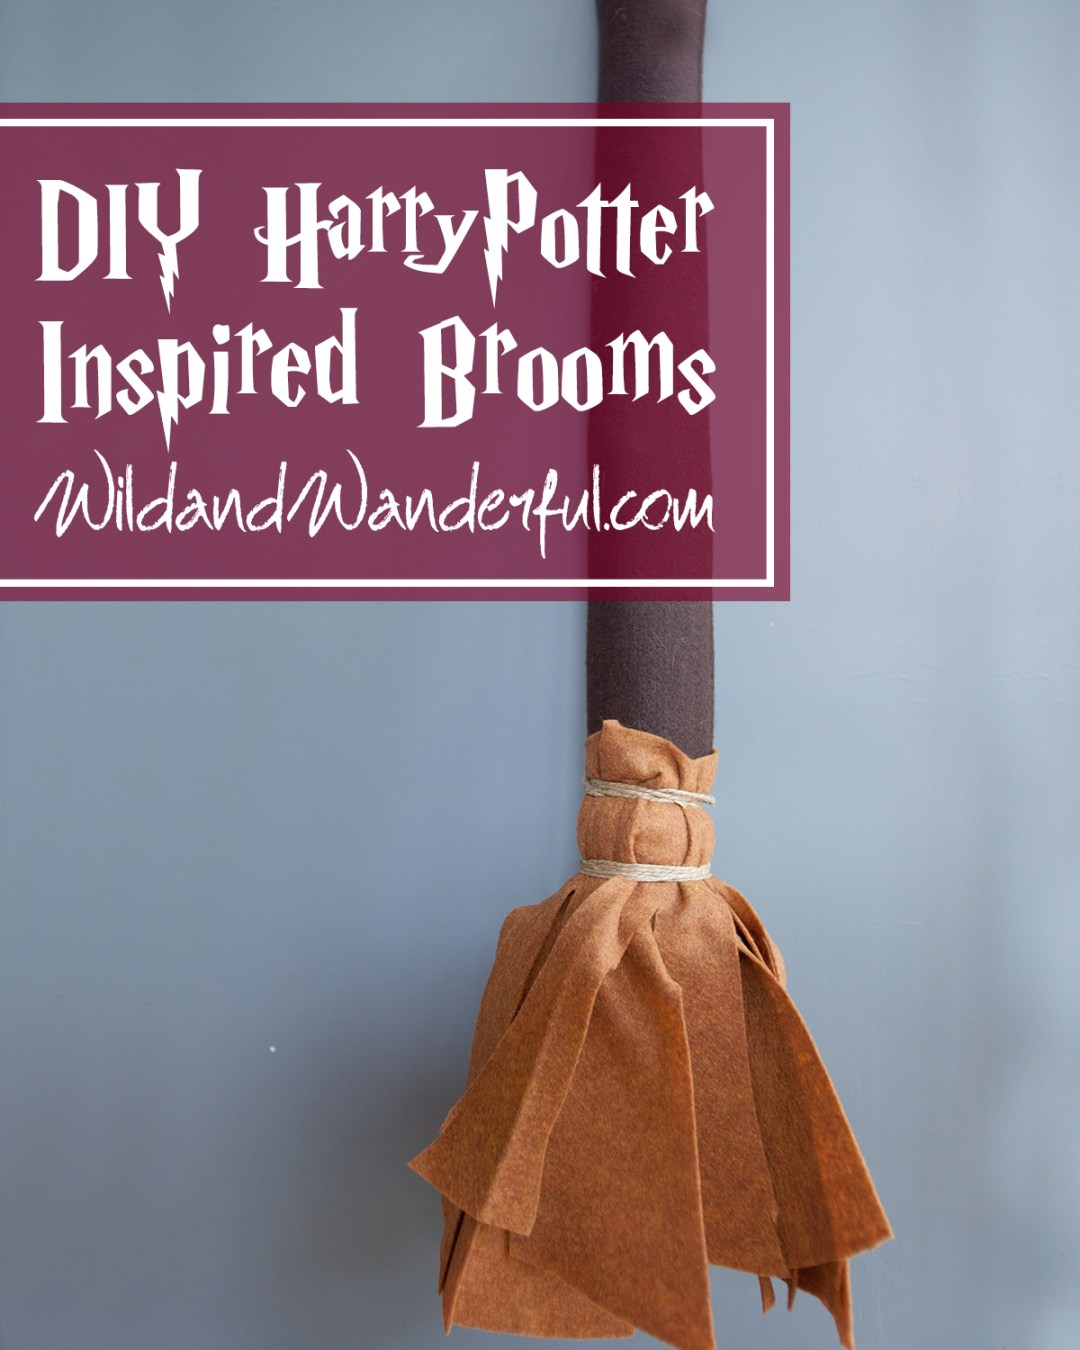 DIY Harry Potter-Inspired Quidditch Brooms